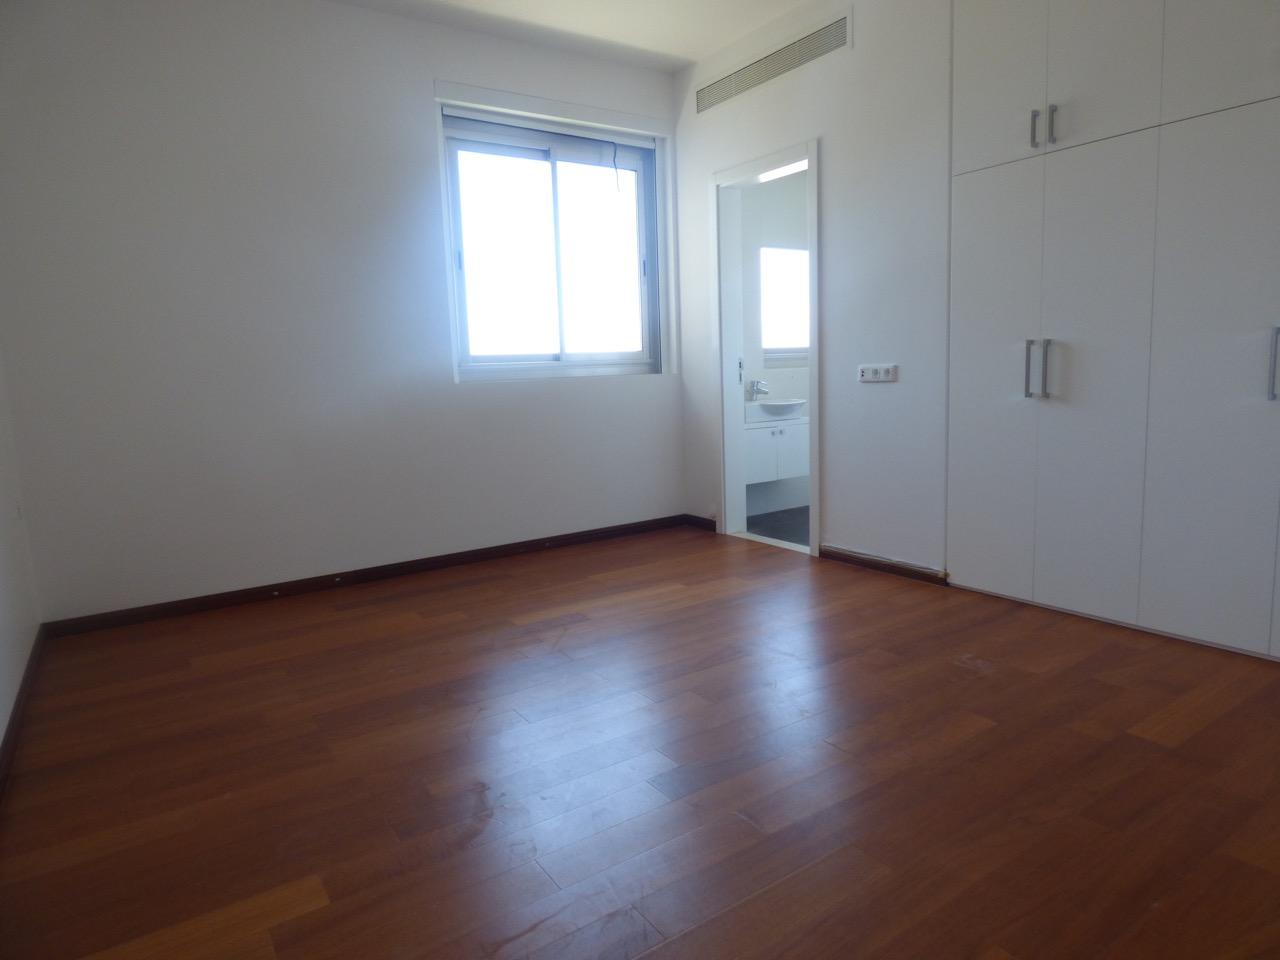 Apartment for rent in Ain el Mreisseh, Beirut